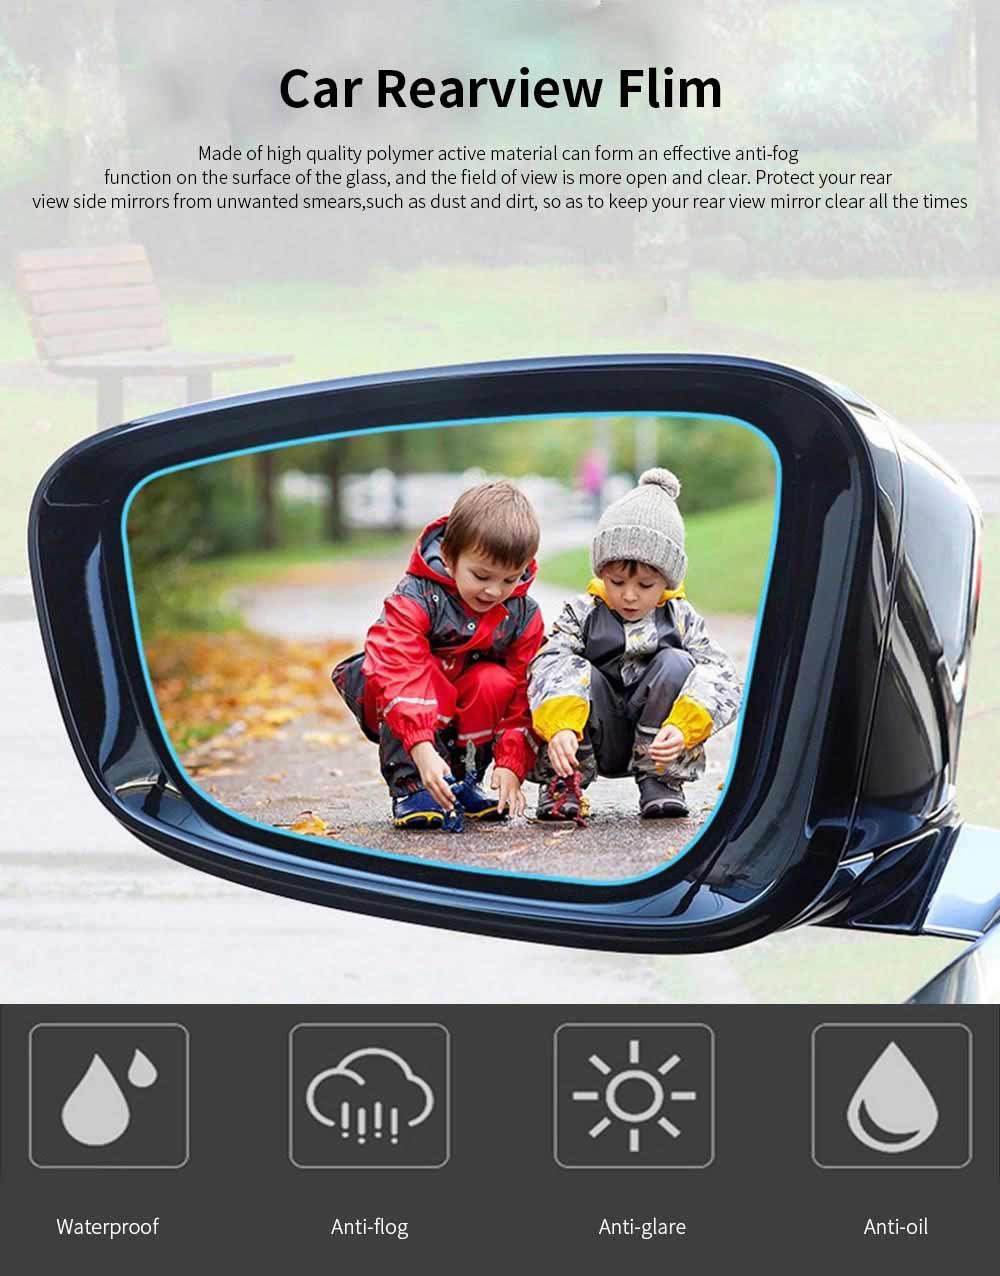 Car Anti Fog Film Anti-Mist Anti-Glare Mirror Waterproof Car Side Mirror Window Protector Film for Toyota Camry RAV4 Highlander PRADO COROLLA 0